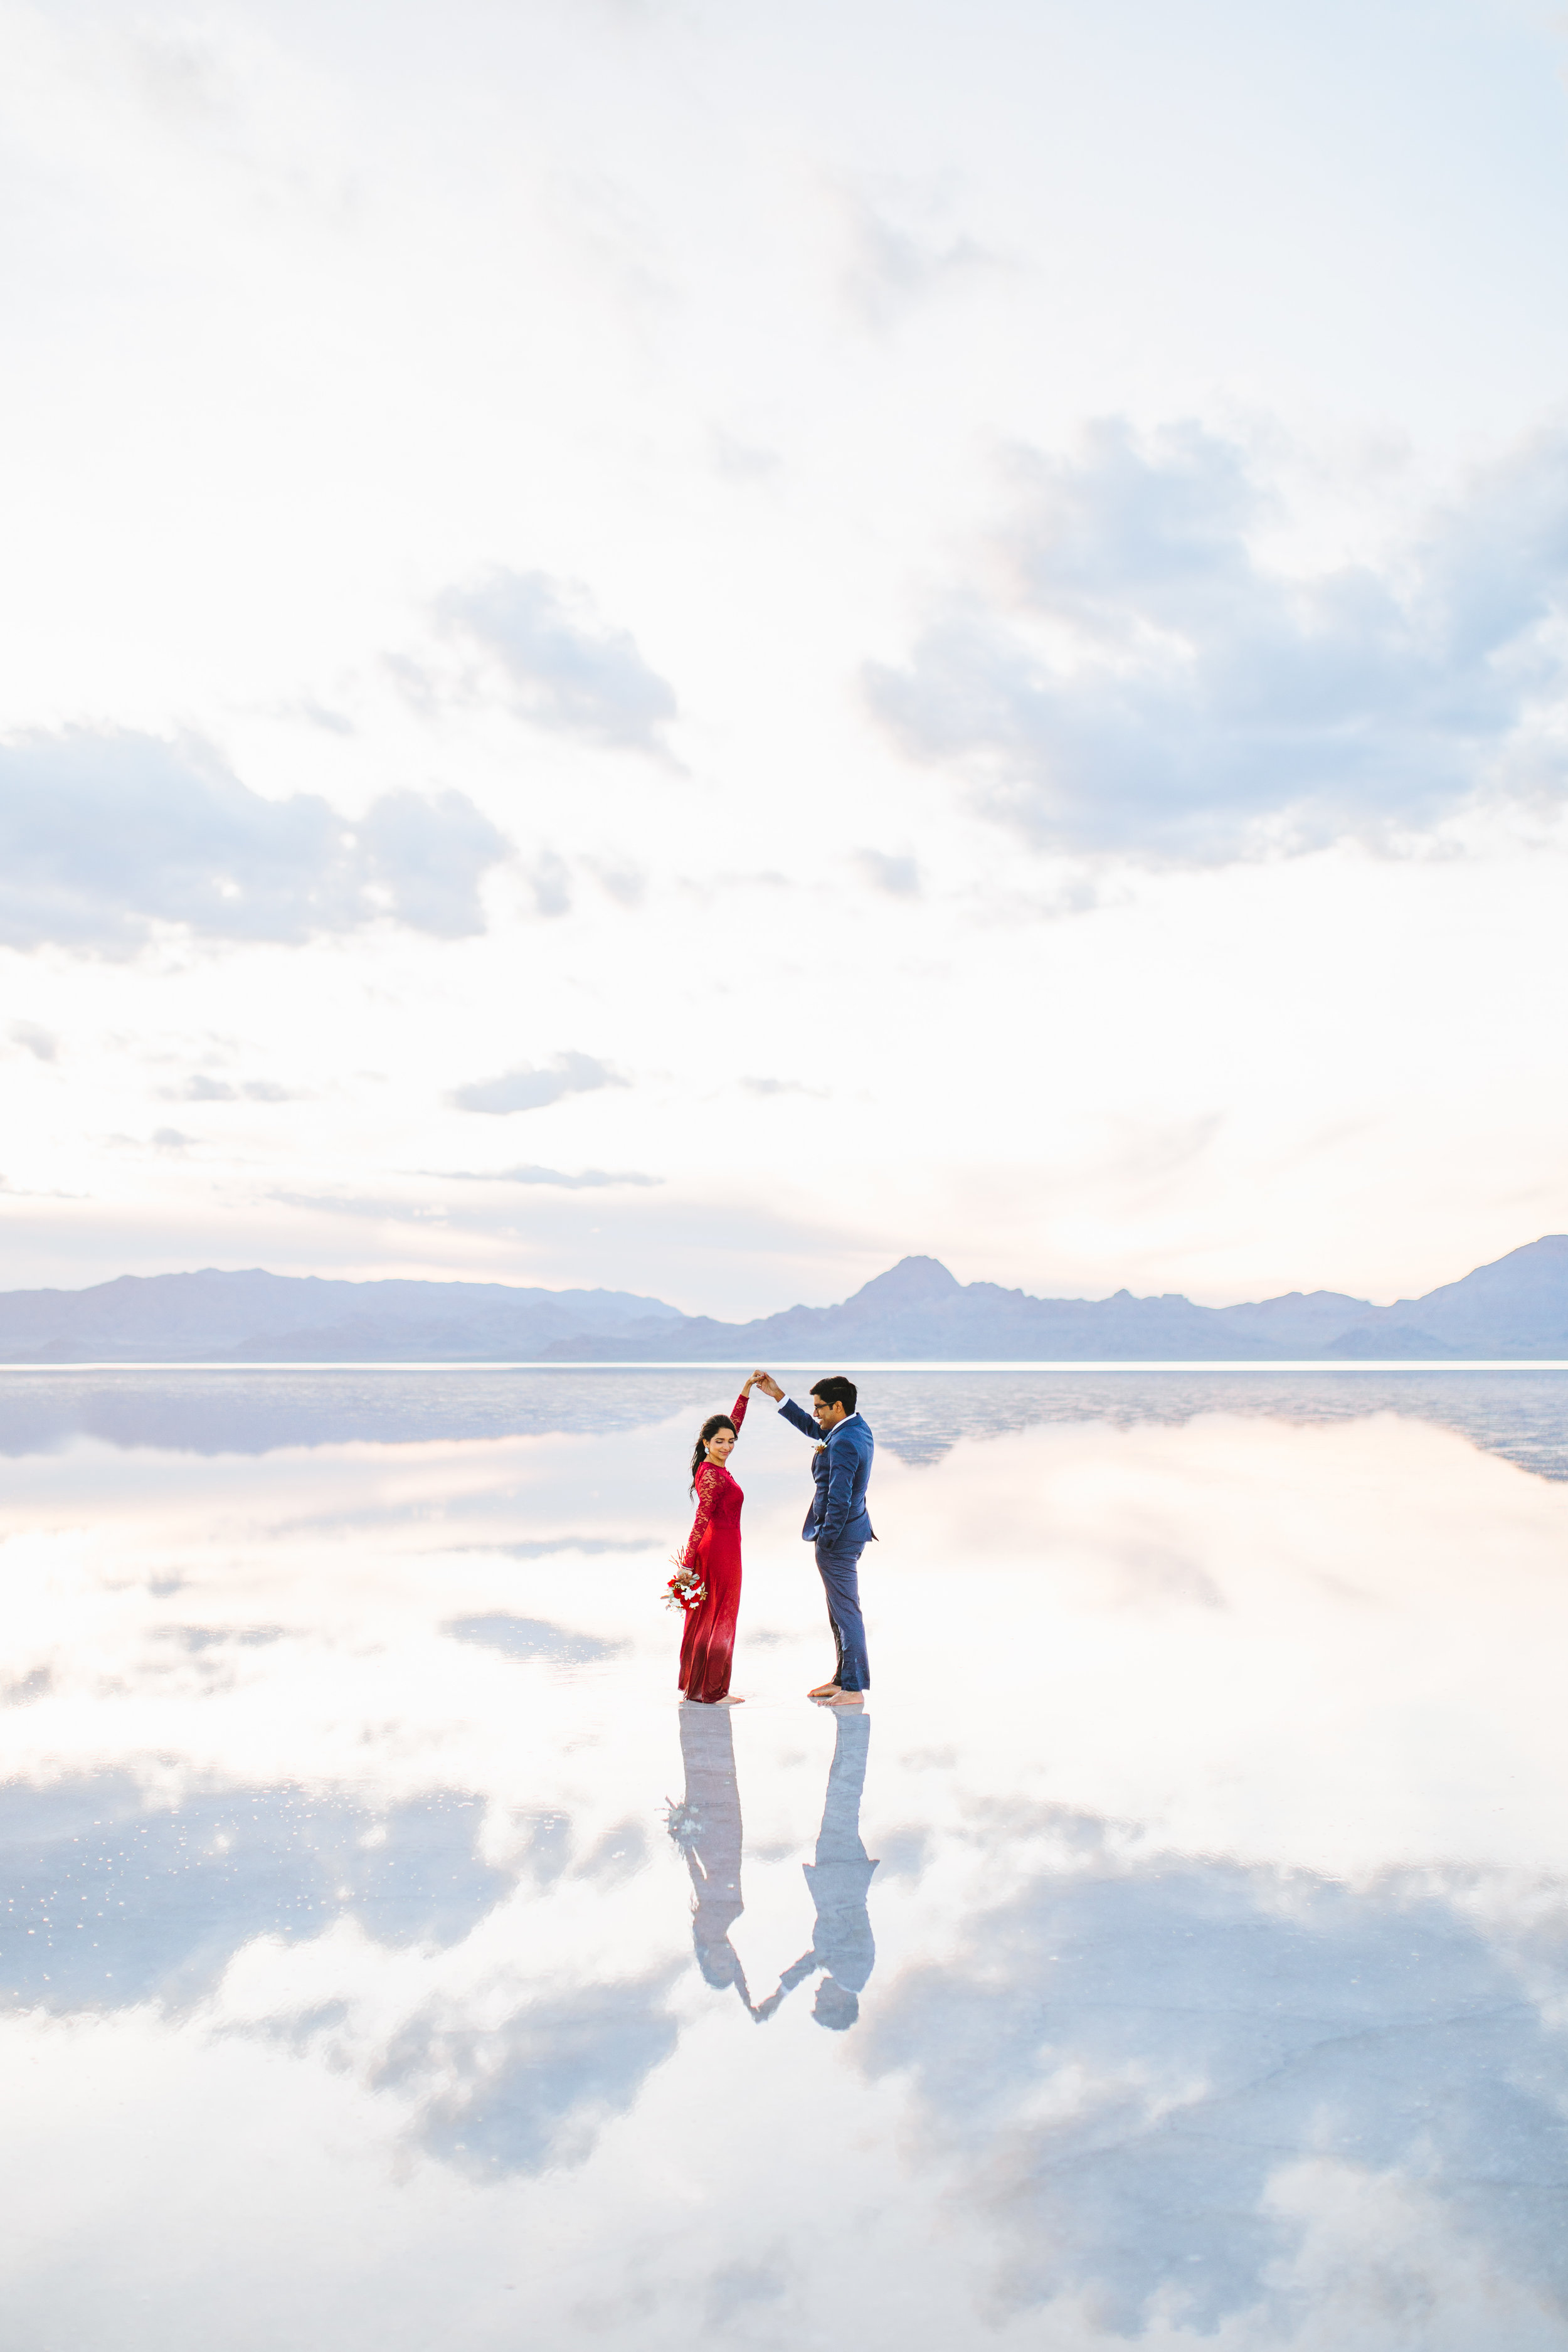 bonneville-salt-flats-engagement-couple-photos-destination-wedding-photography-15.jpg